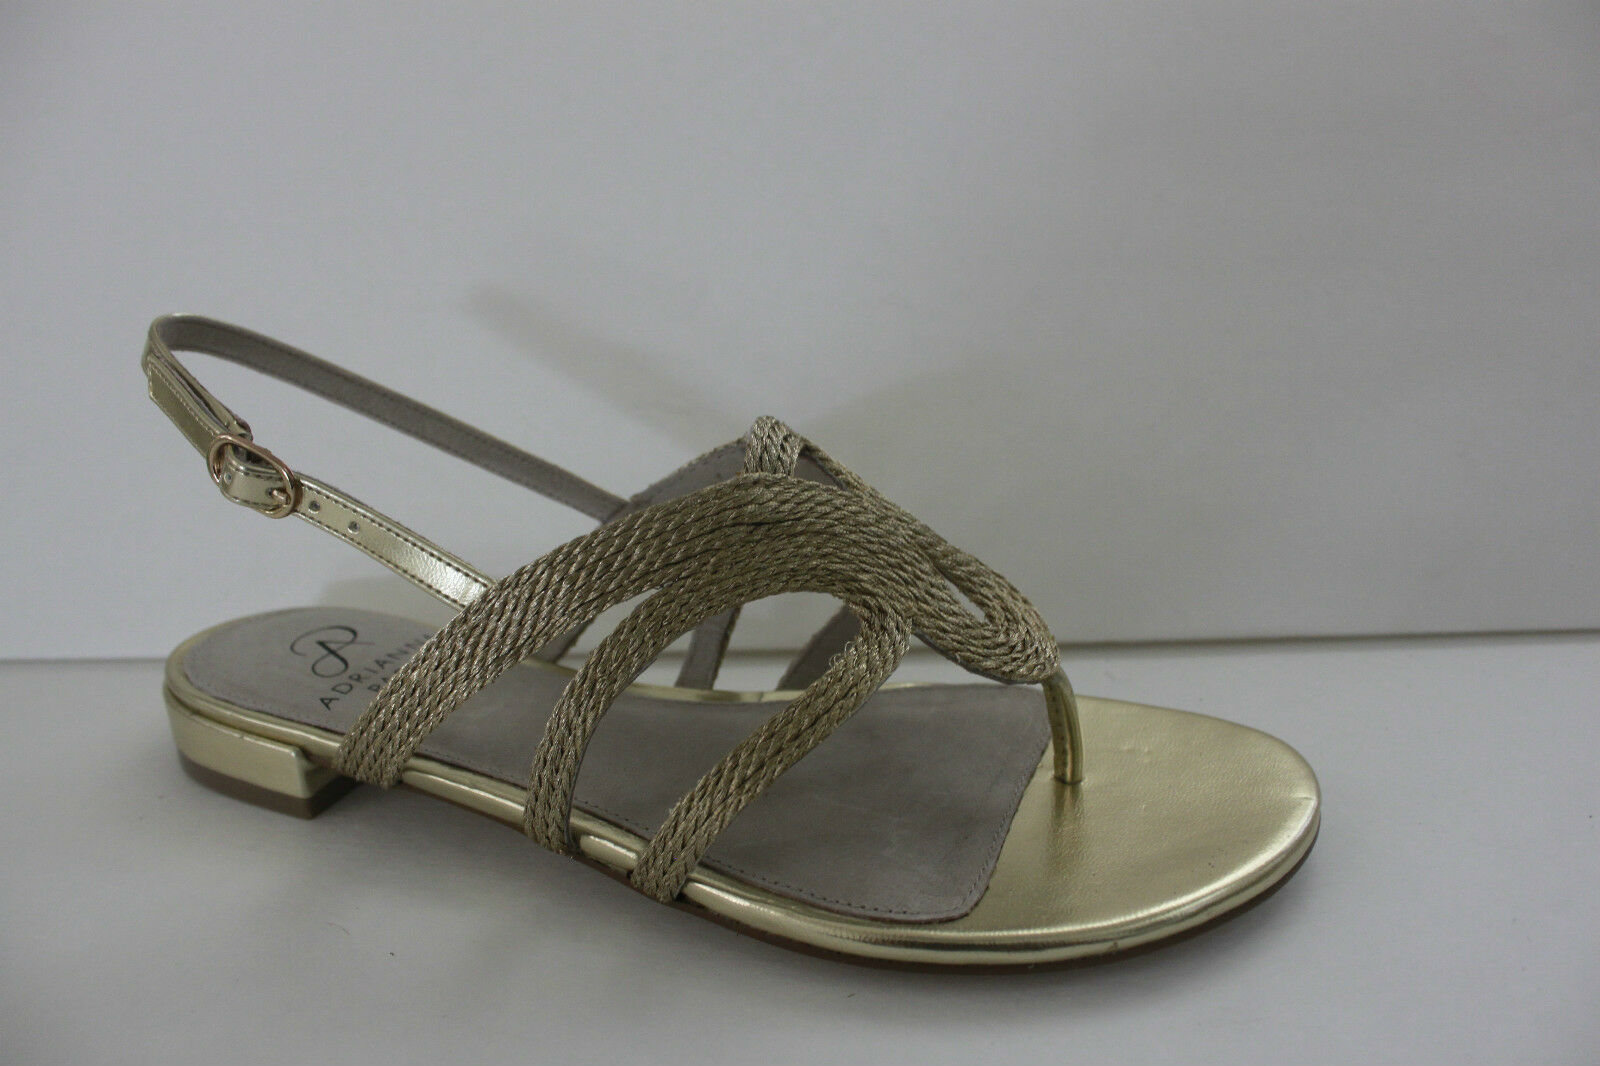 Adrianna Papell para mujeres zapatos M oro Metálico Zapato Sandalia Plana Nuevo en Caja